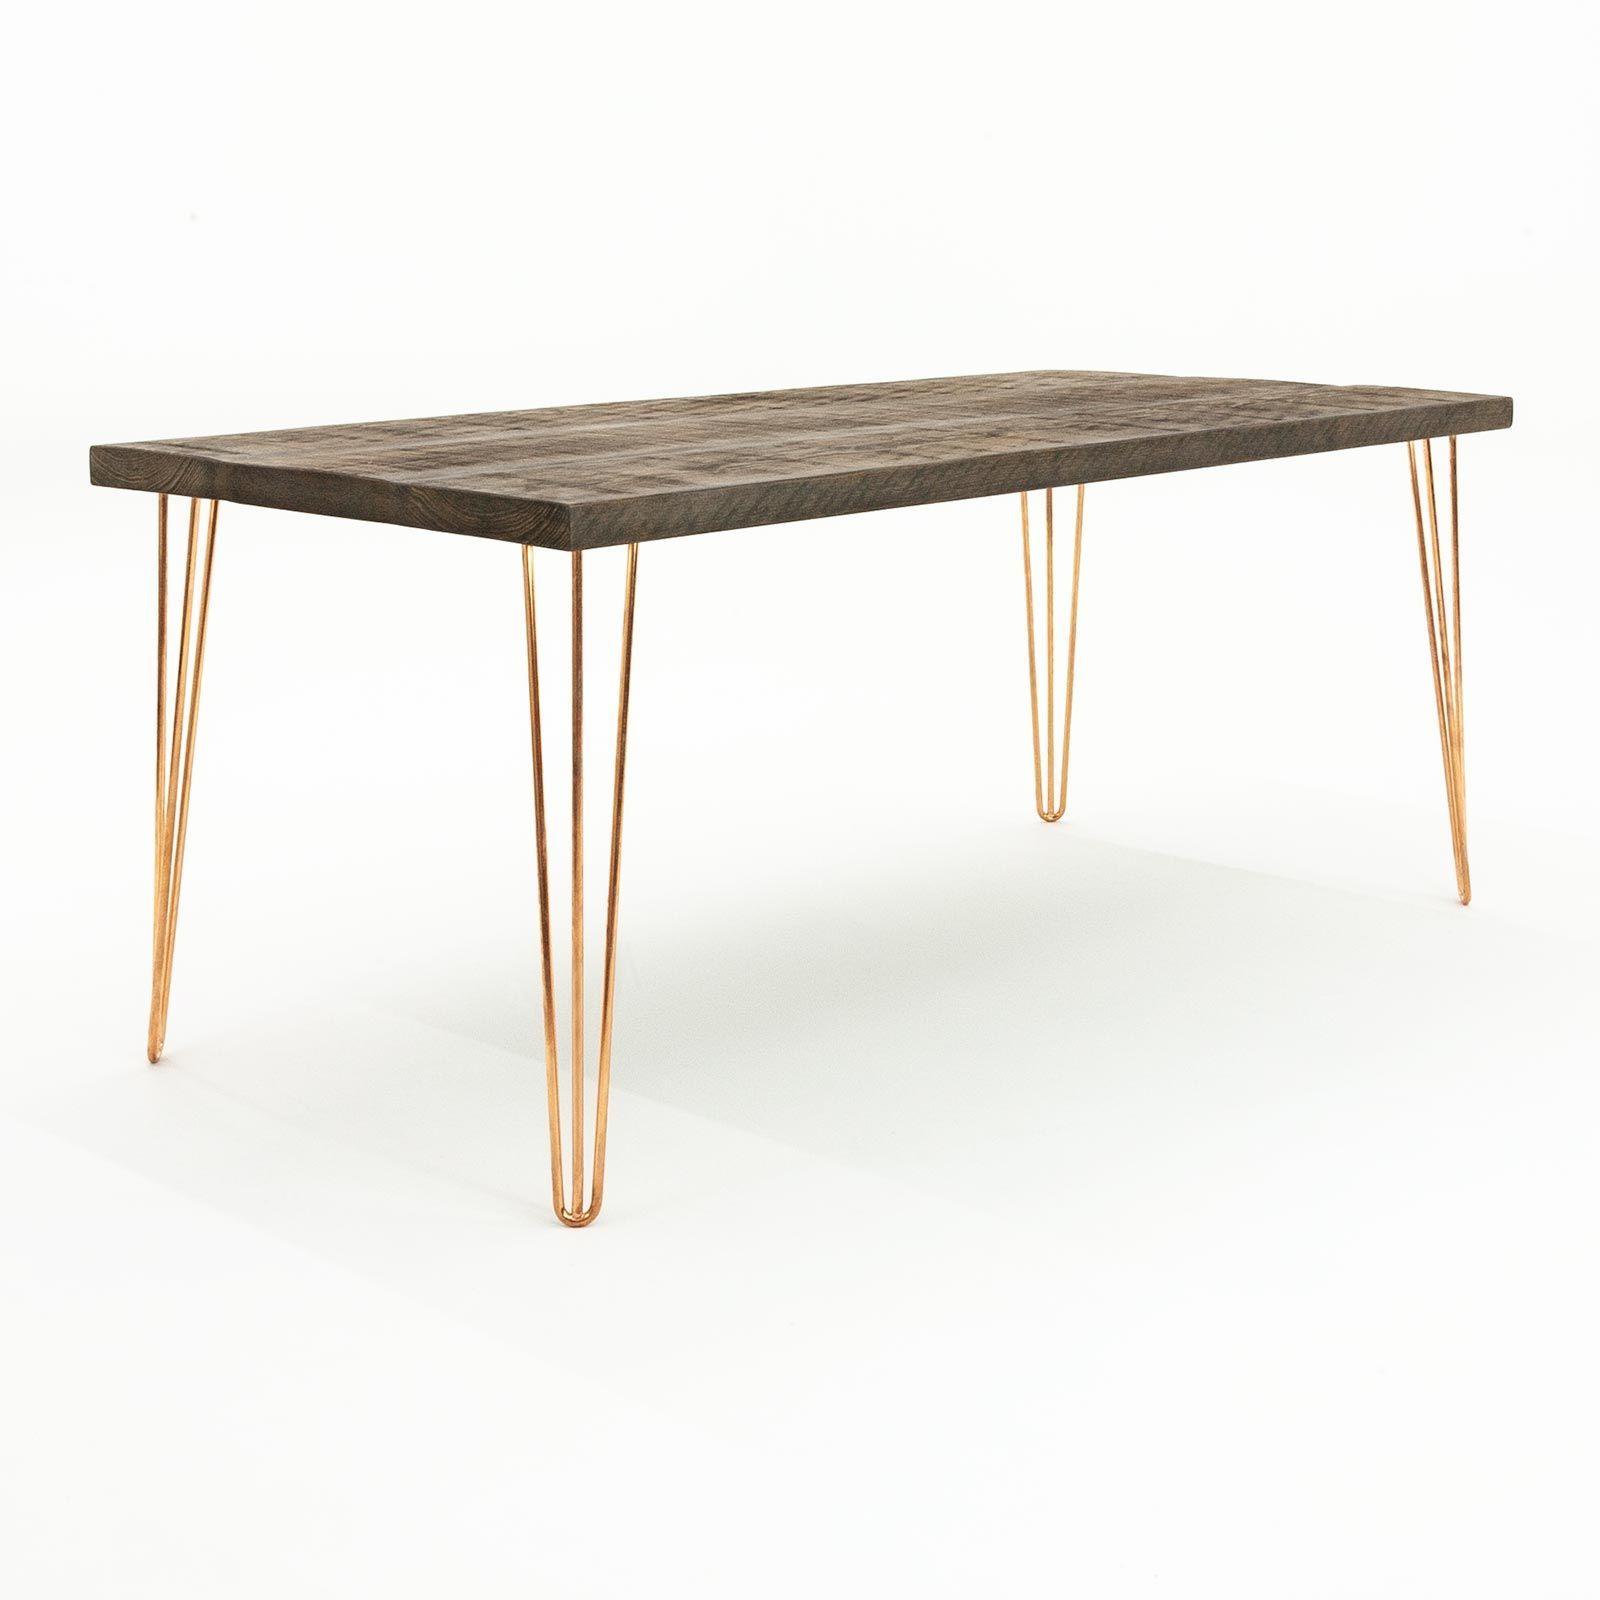 Ouseburn Hairpin Leg Dining Table Medium Oak Copper 120cm